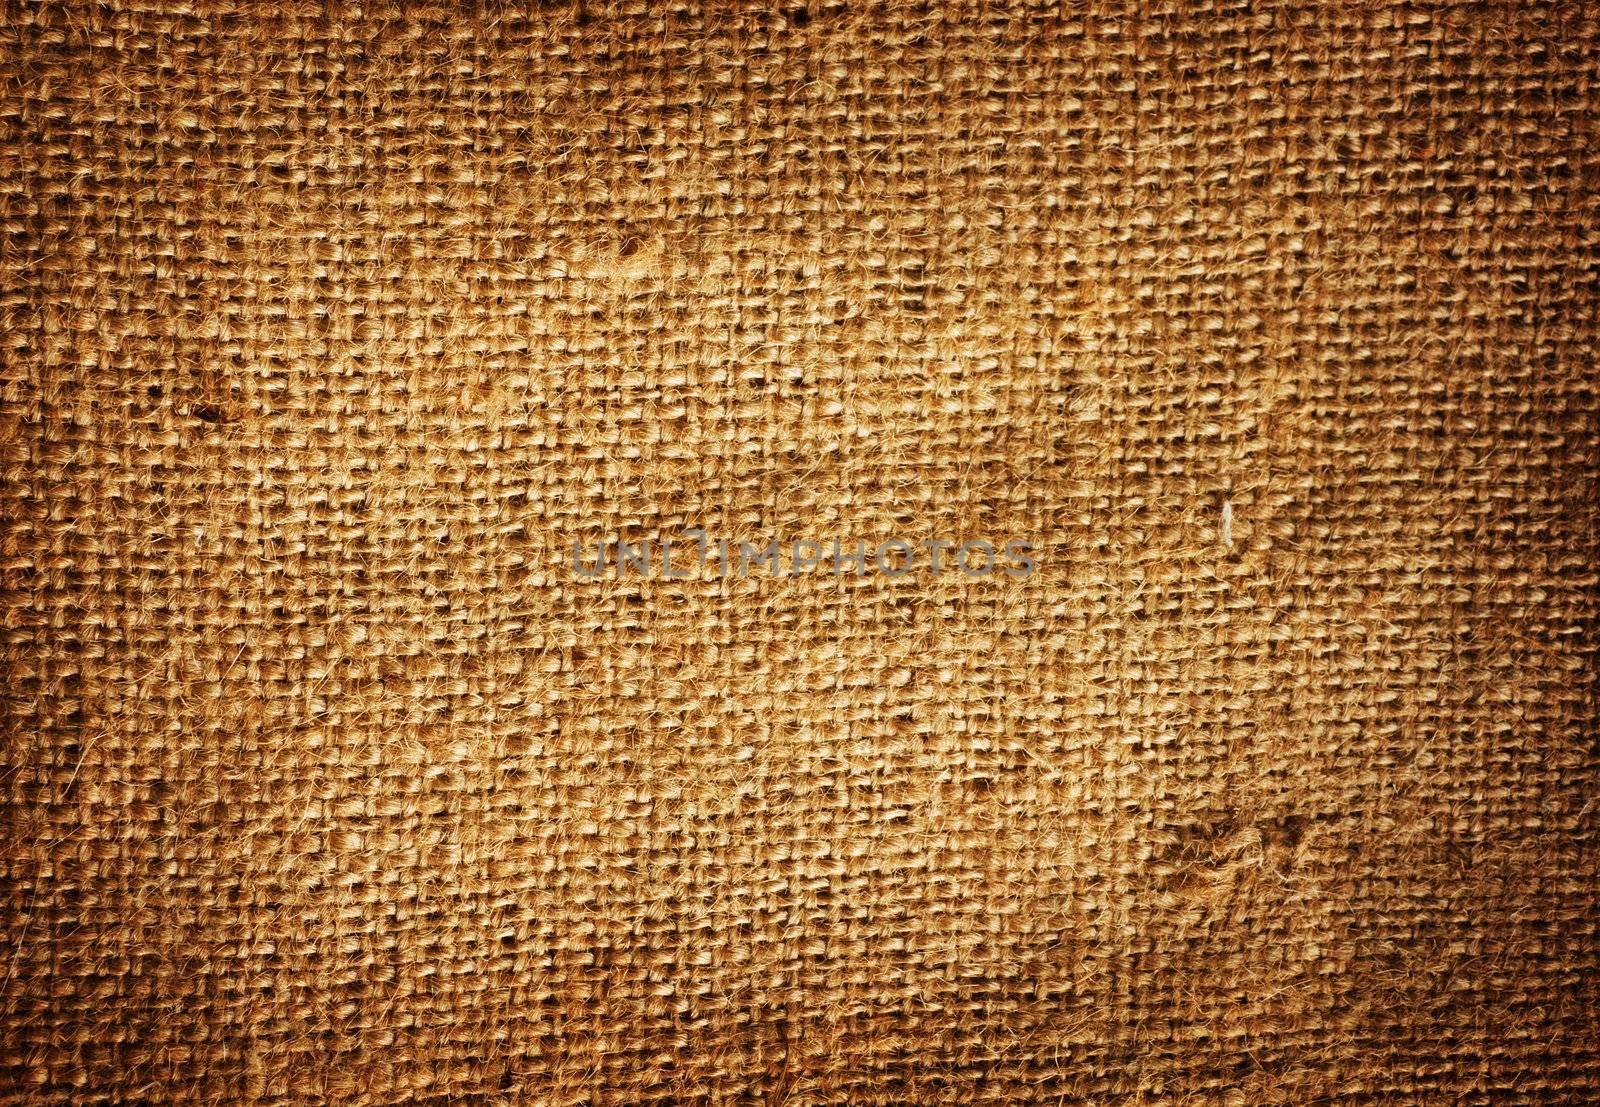 Texture of sack. Burlap background